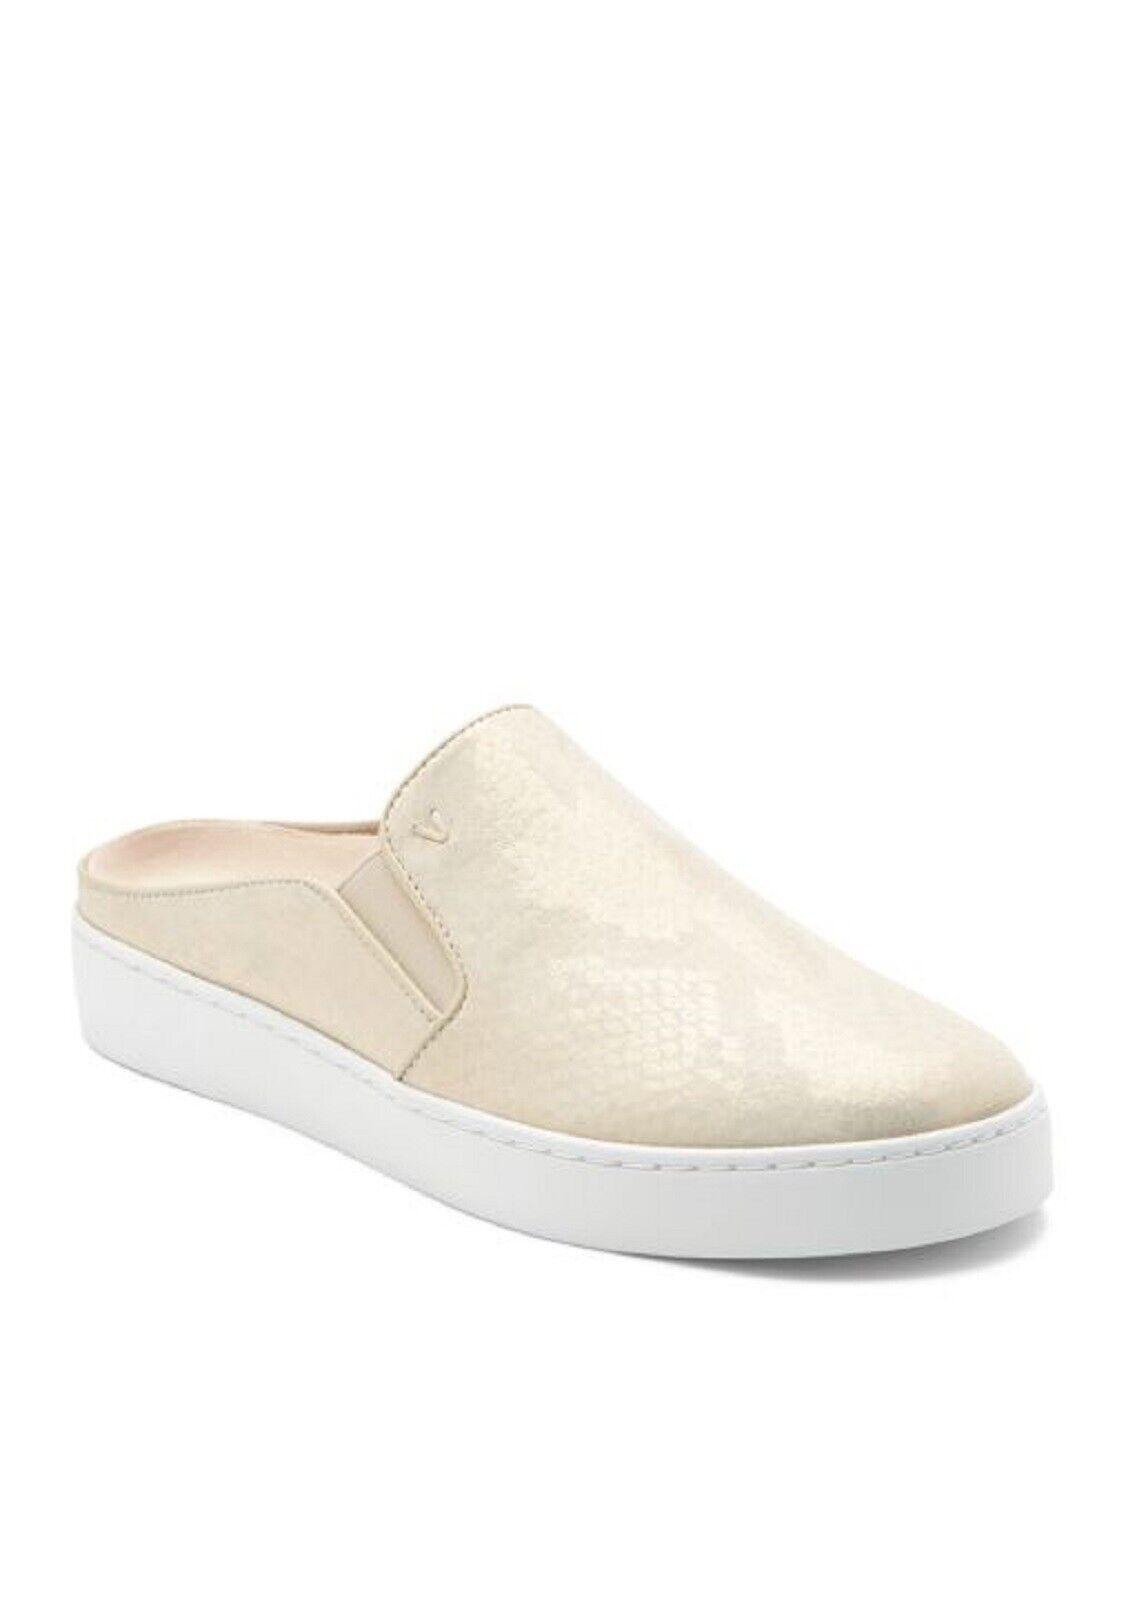 lo stile classico VIONIC Ladies SPLENDID DAKOTA scarpe da da da ginnastica Mules oro Sz. 10 M  NIB  presa